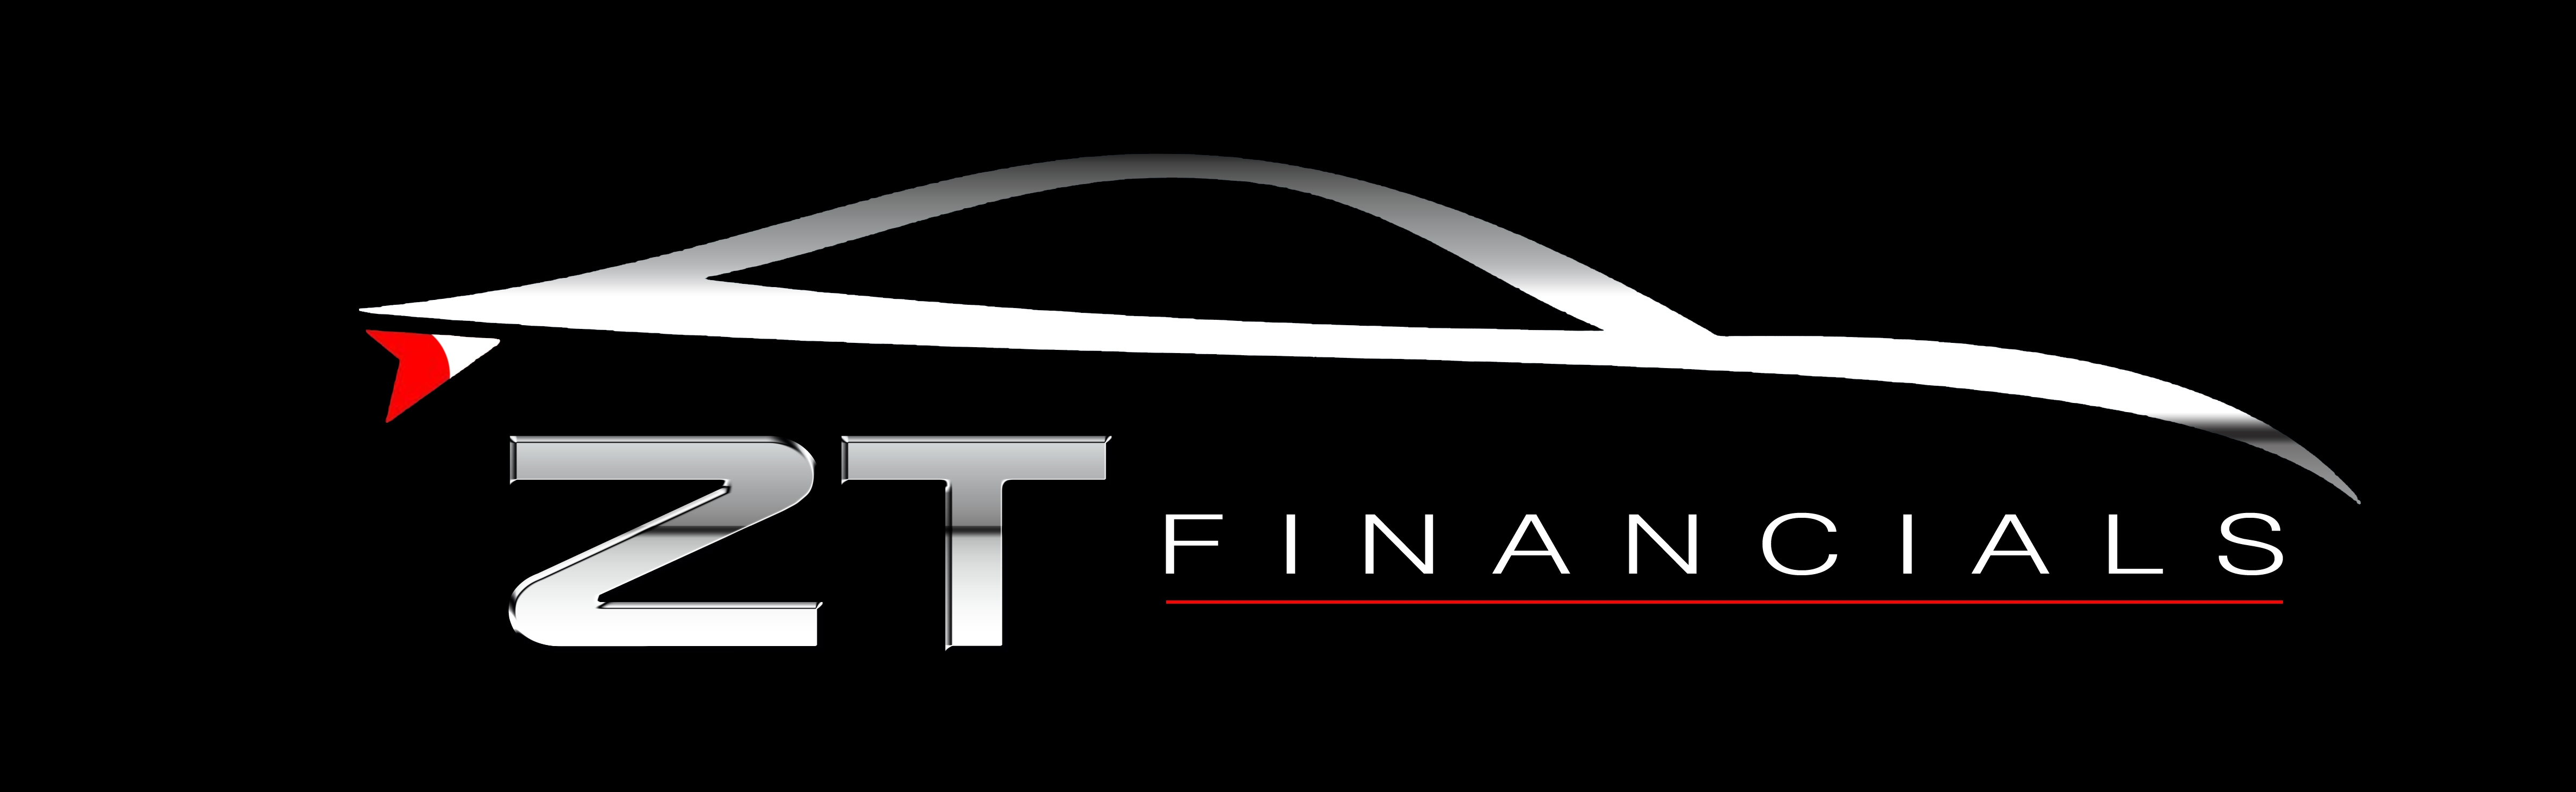 ZT Auto Financial 2014 LAND ROVER RANGE ROVER SPORT